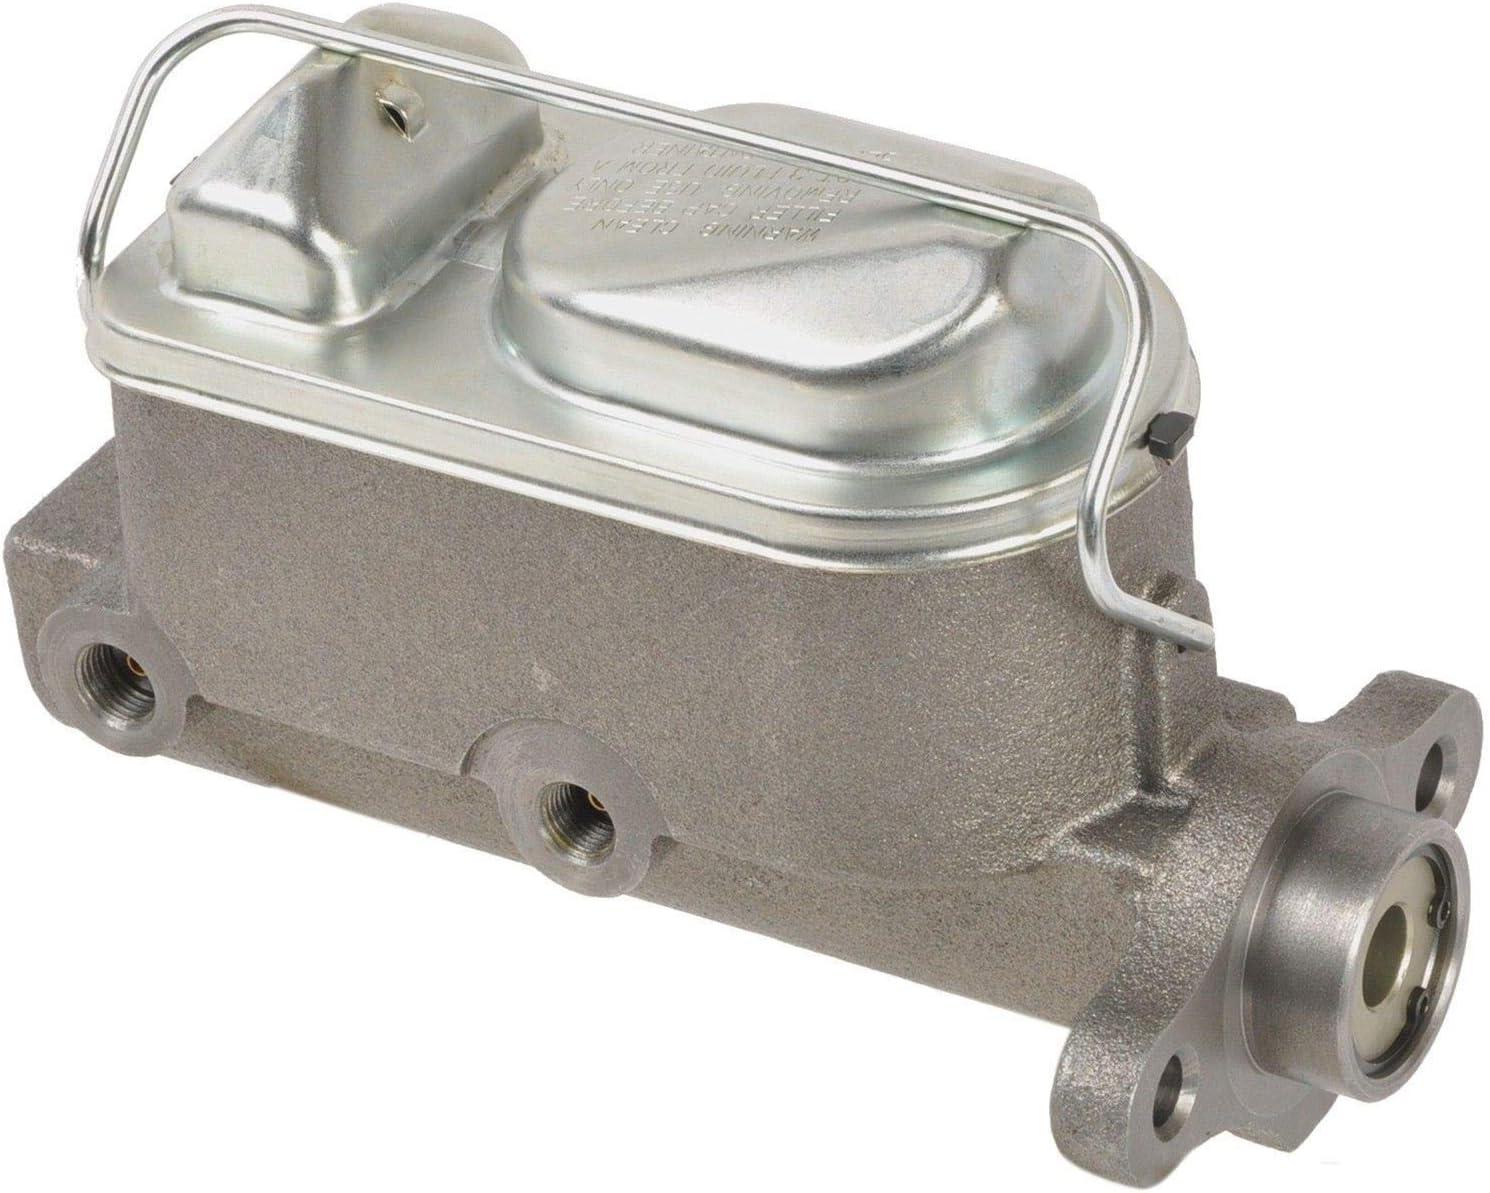 Brake master cylinder for Ford E250 E350 F250 F350 1976 M83074 MC39014